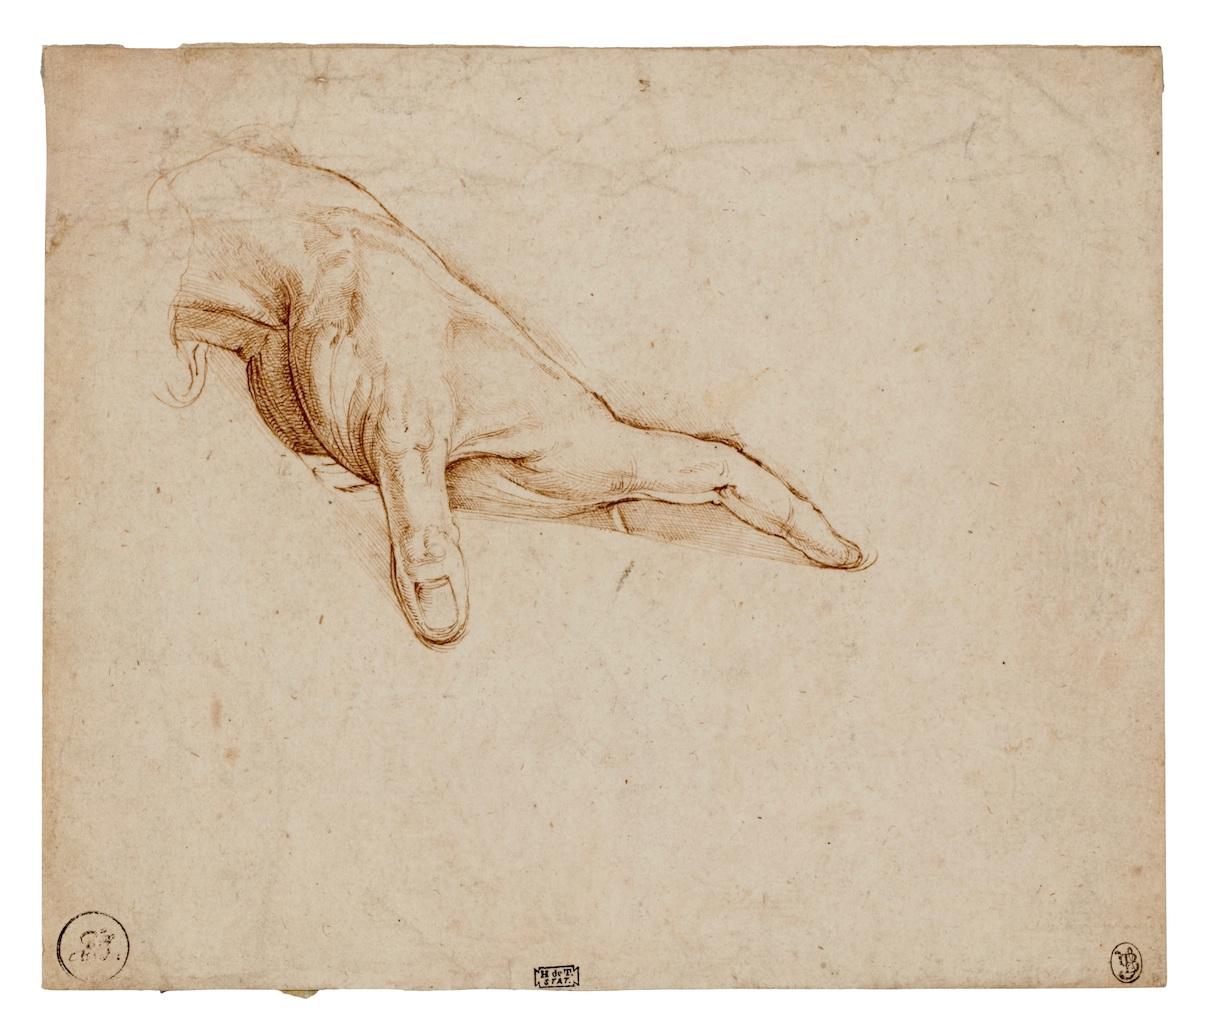 Battista Franco, Etude de amin, Plume et encre brune 195×235 mm Galerie de Bayser